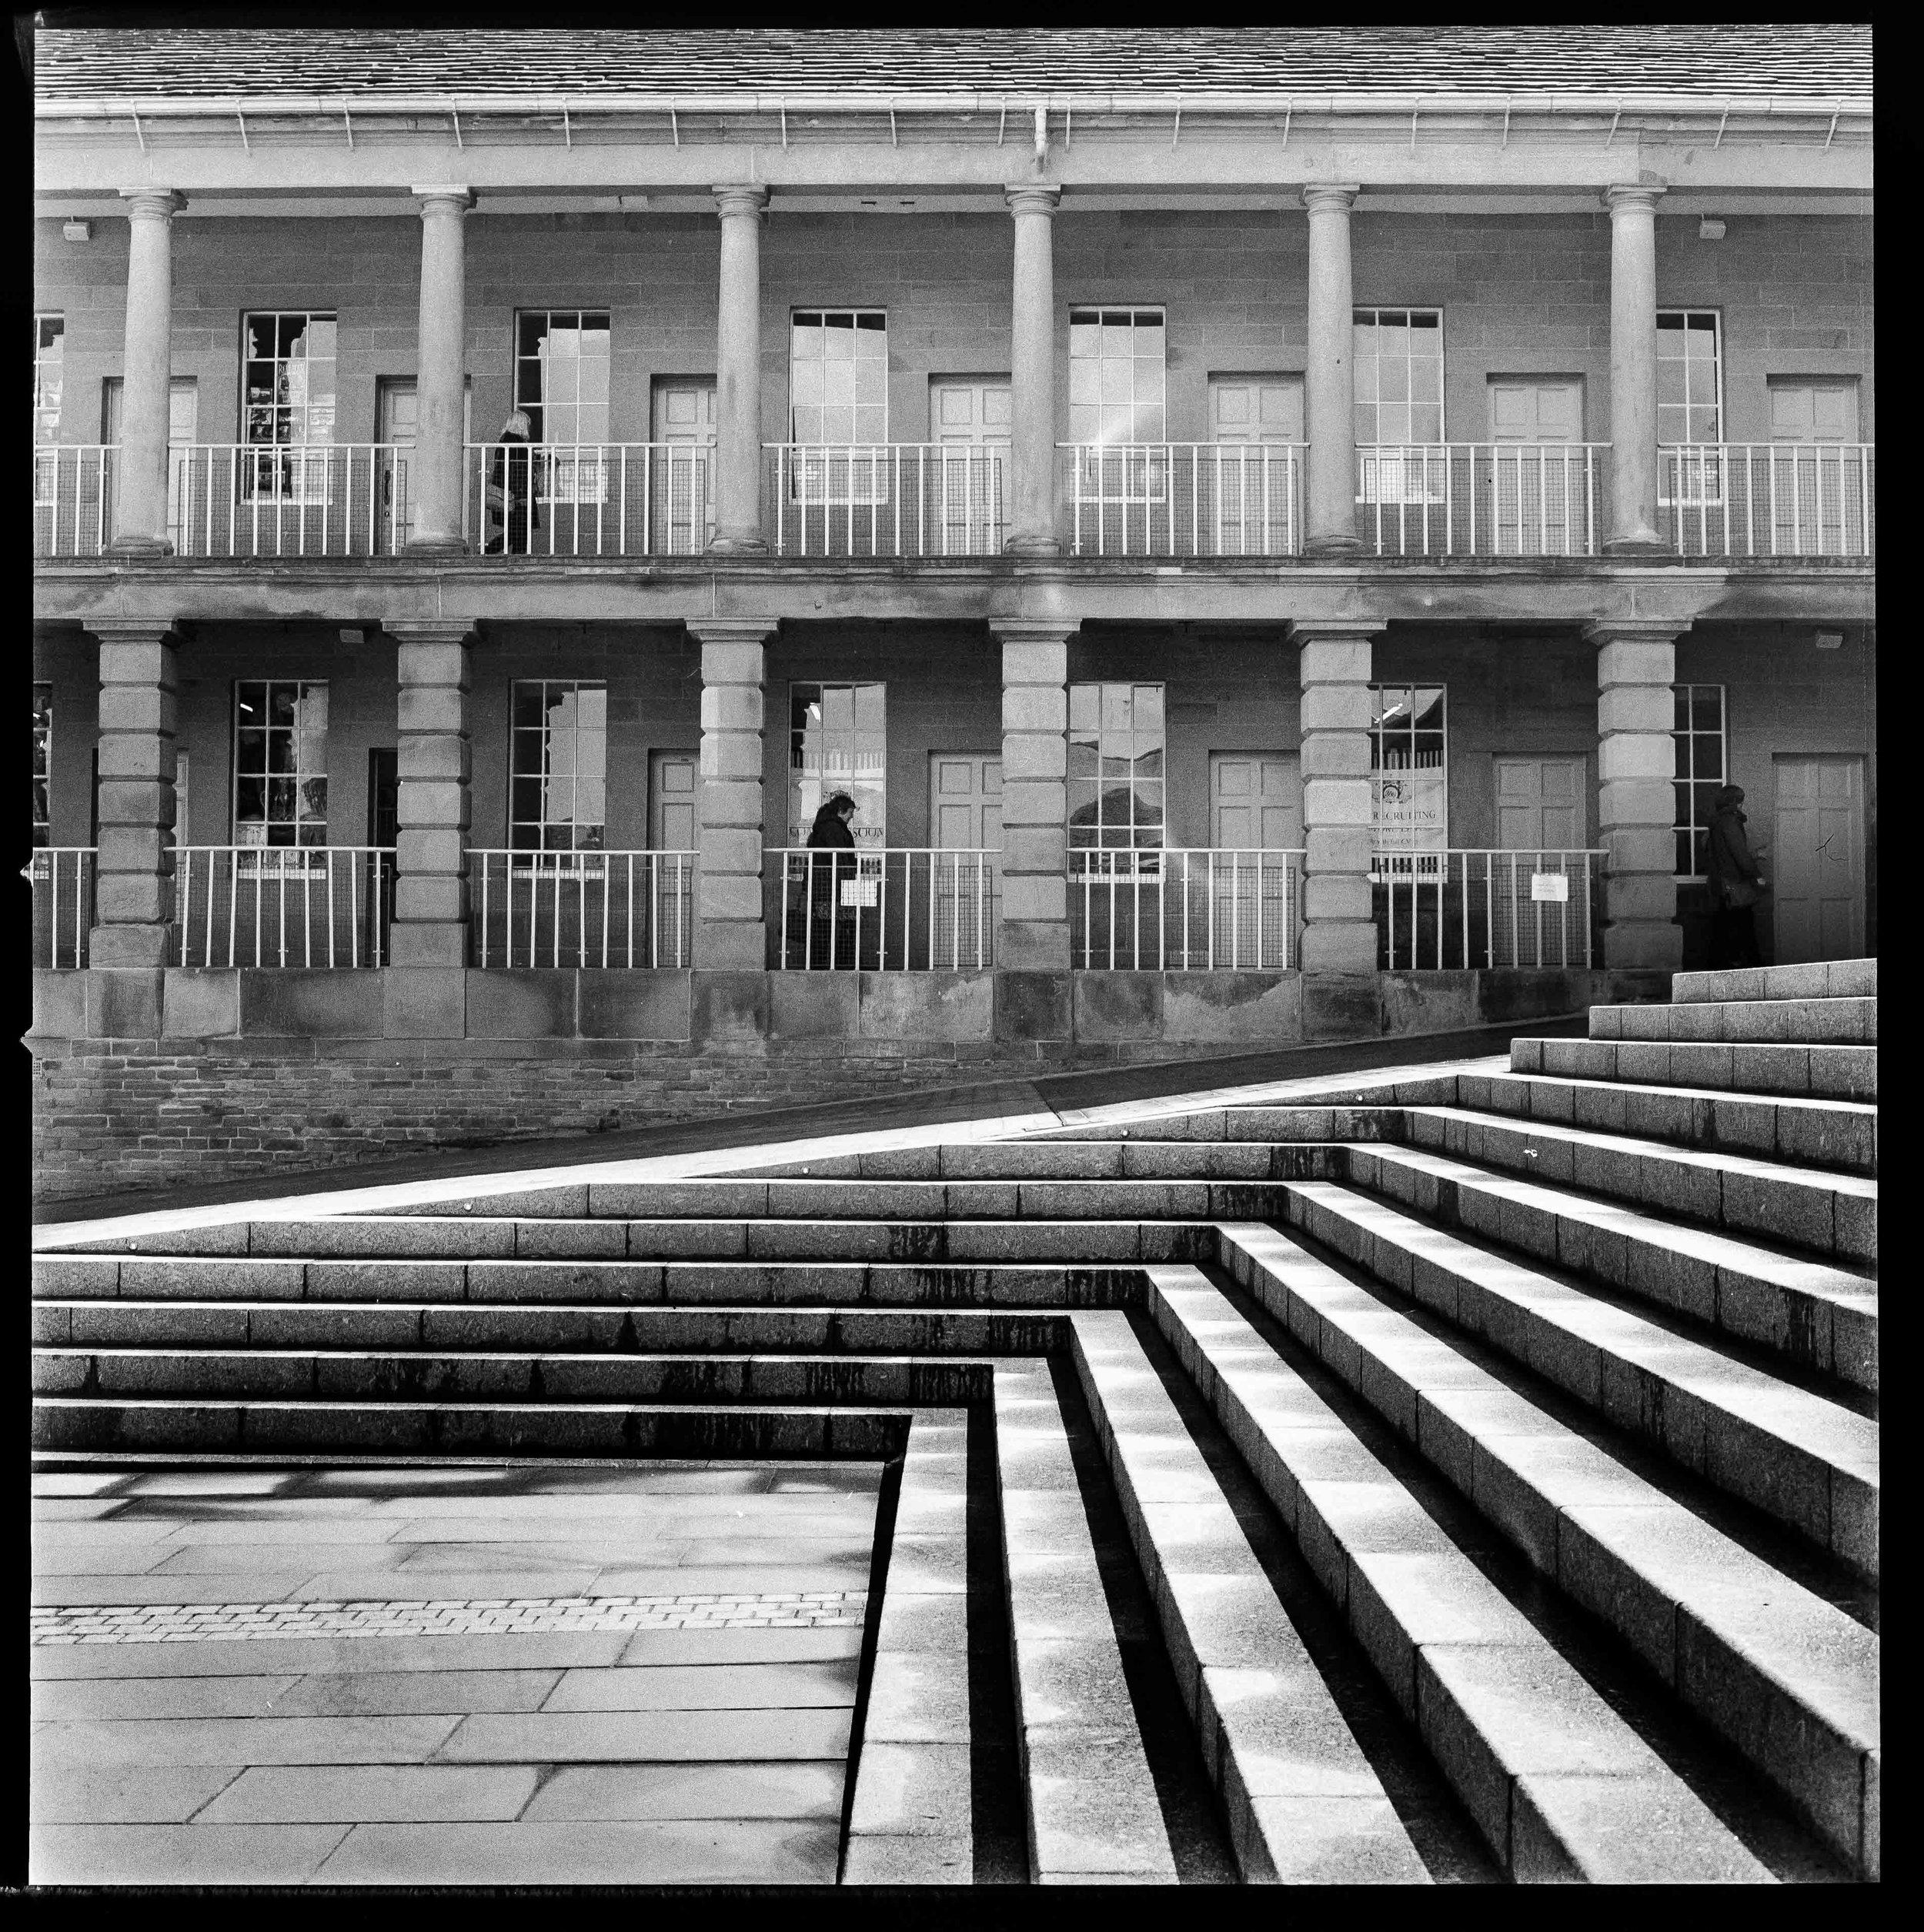 The Piece Hall Halifax